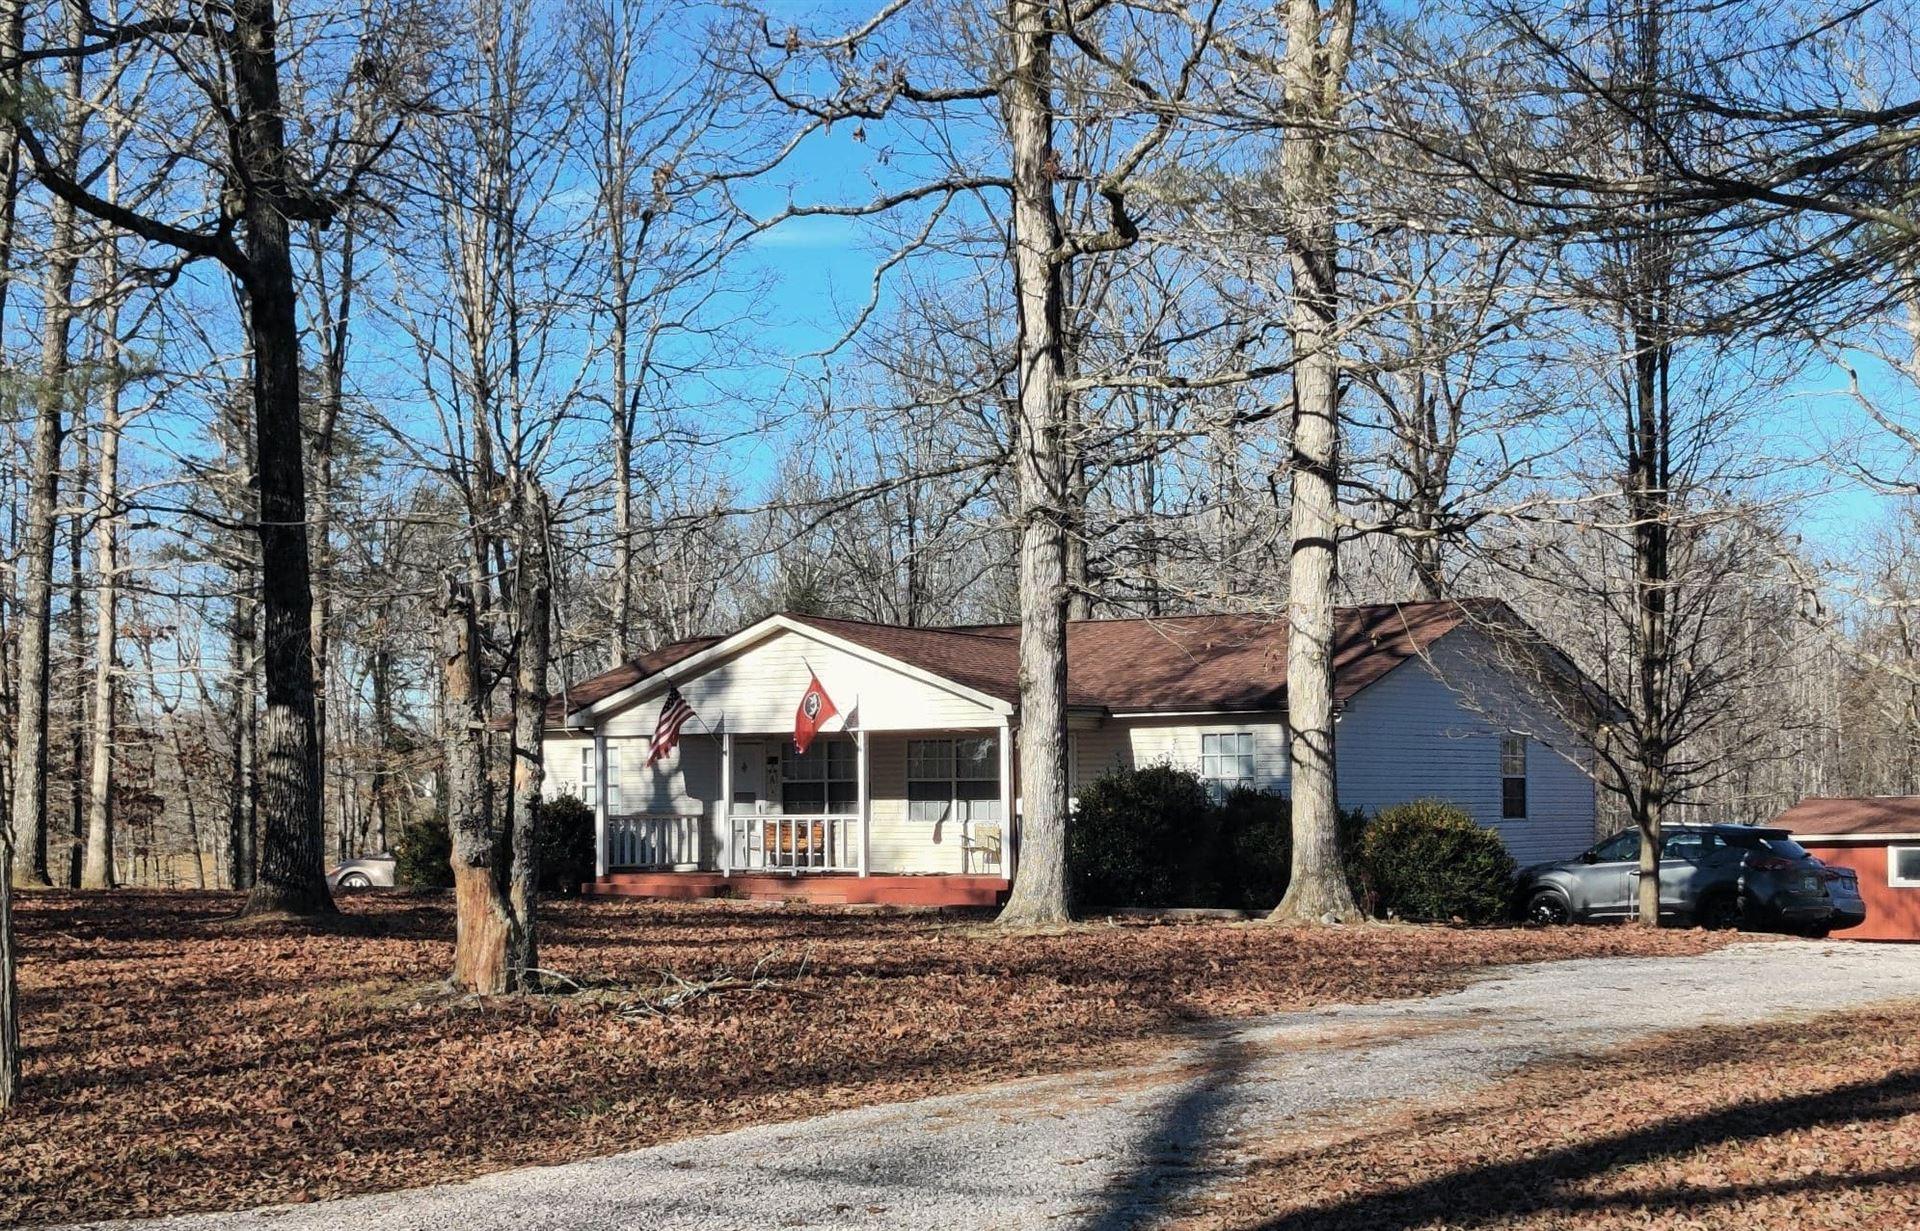 903 Eaglenest Rd, Monteagle, TN 37356 - MLS#: 2230105